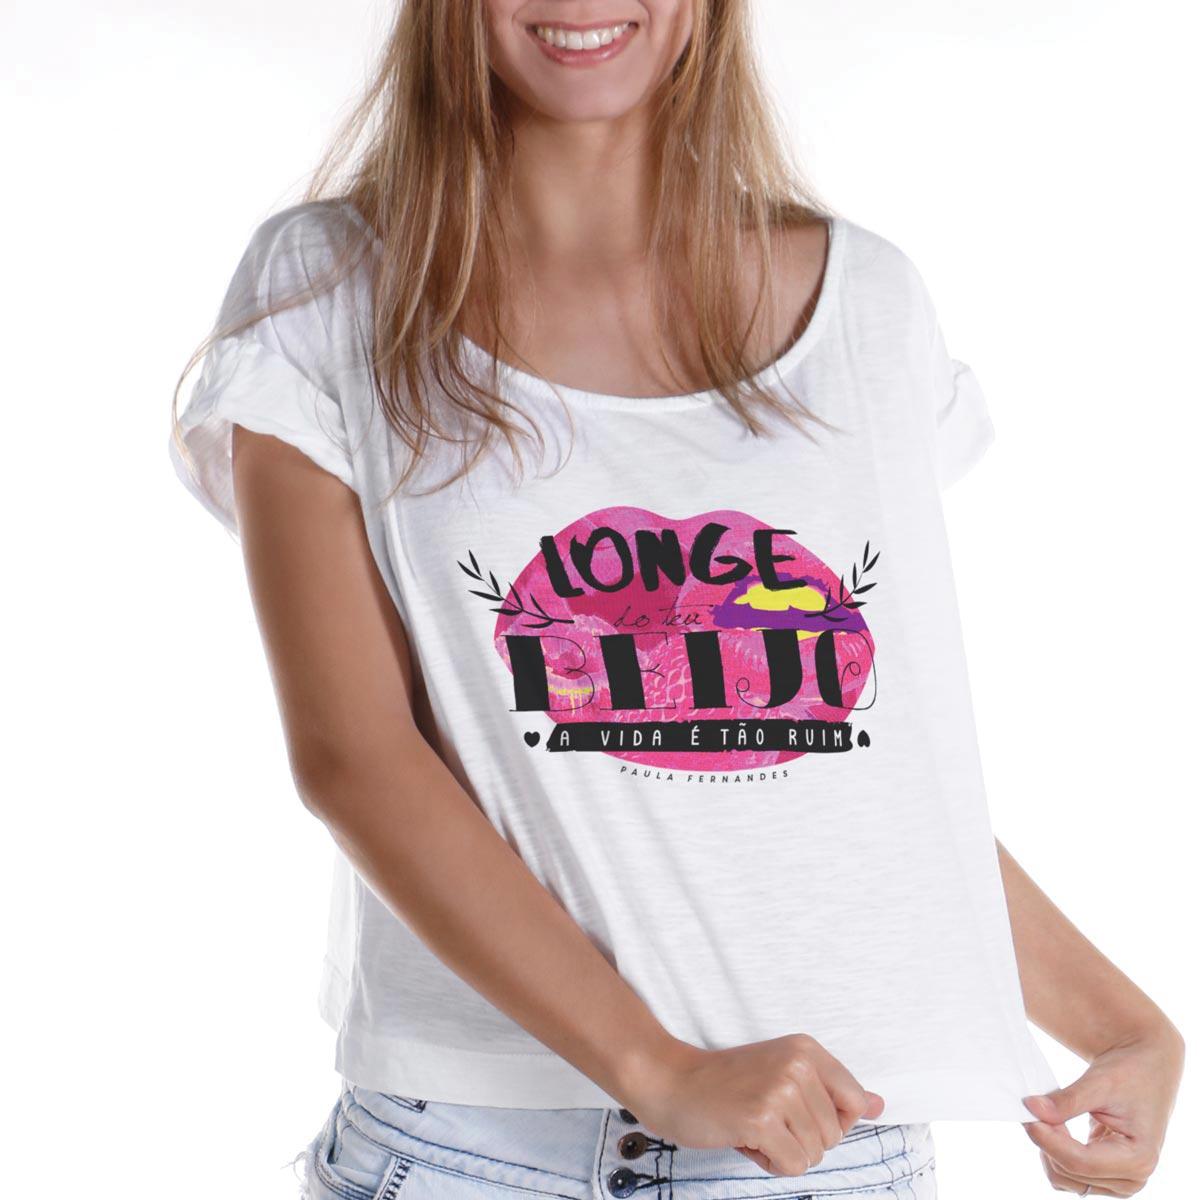 T-shirt Premium Feminina Paula Fernandes Longe do Teu Beijo